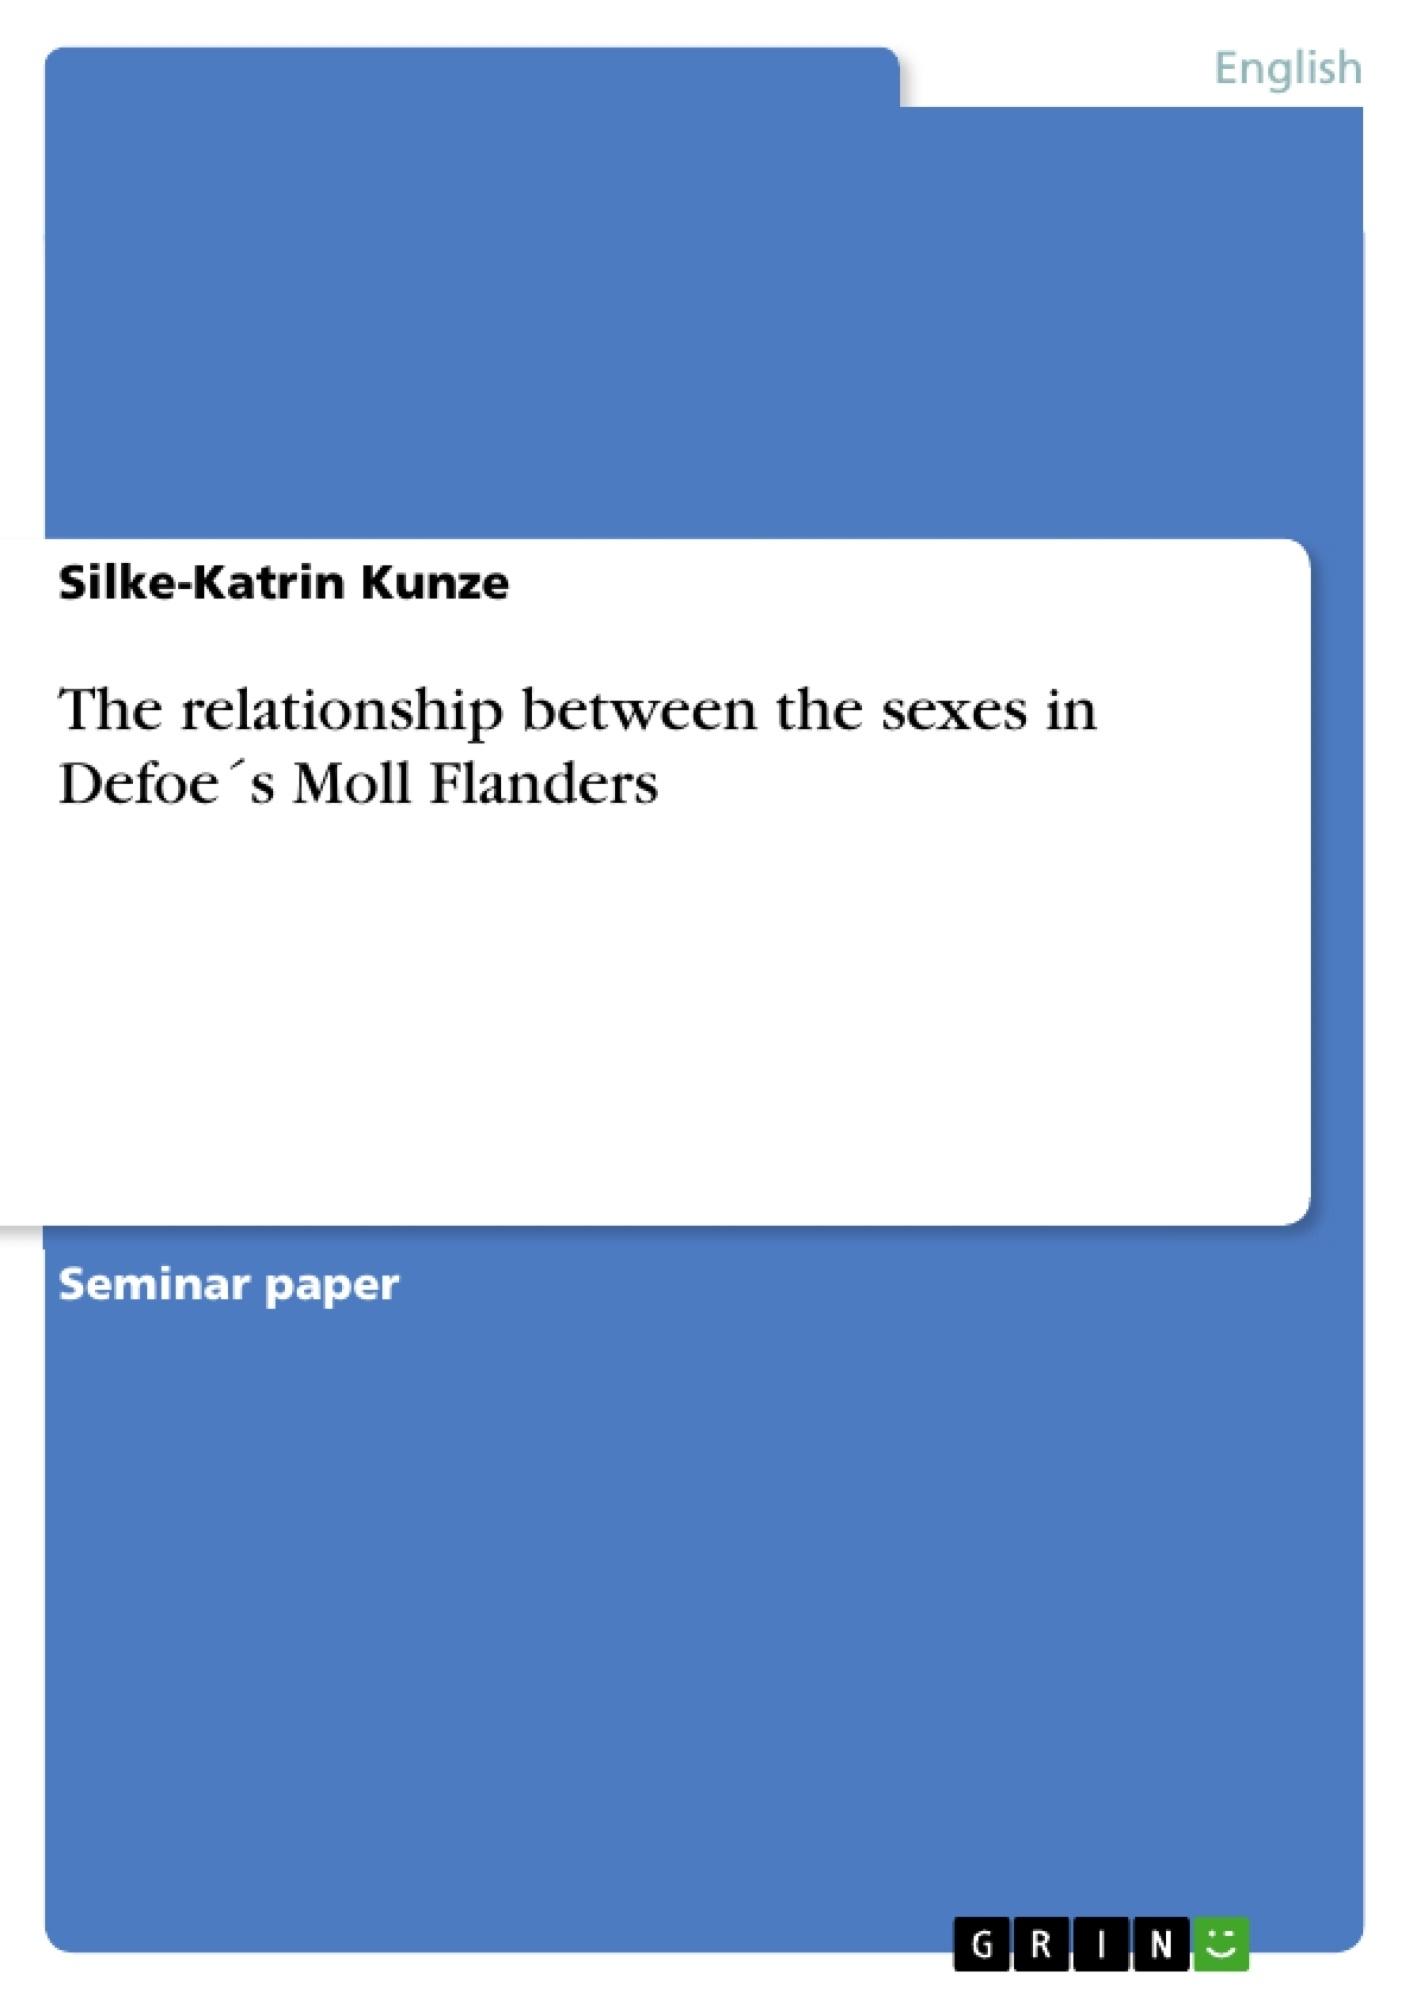 Title: The relationship between the sexes in Defoe´s  Moll Flanders